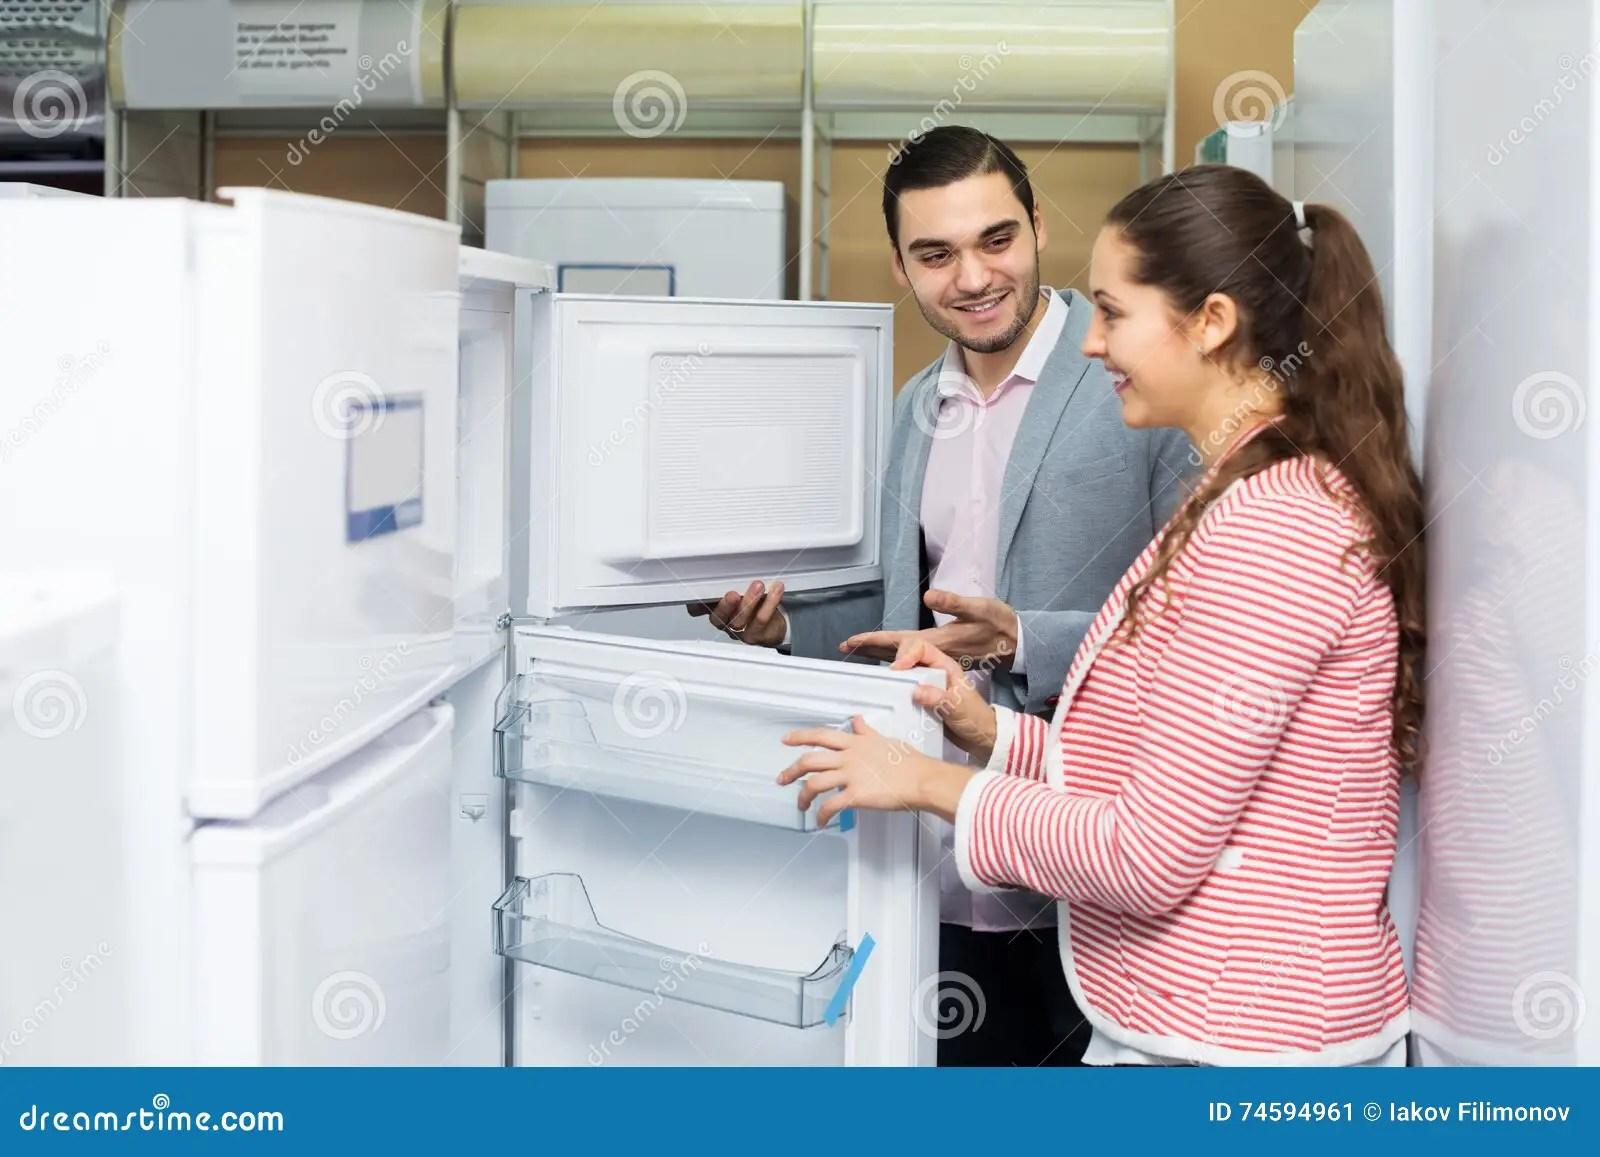 Mini Kühlschrank Monster Energy Kaufen : Kùhlschrank kaufen juggernog kühlschrank kaufen mini kühlschrank